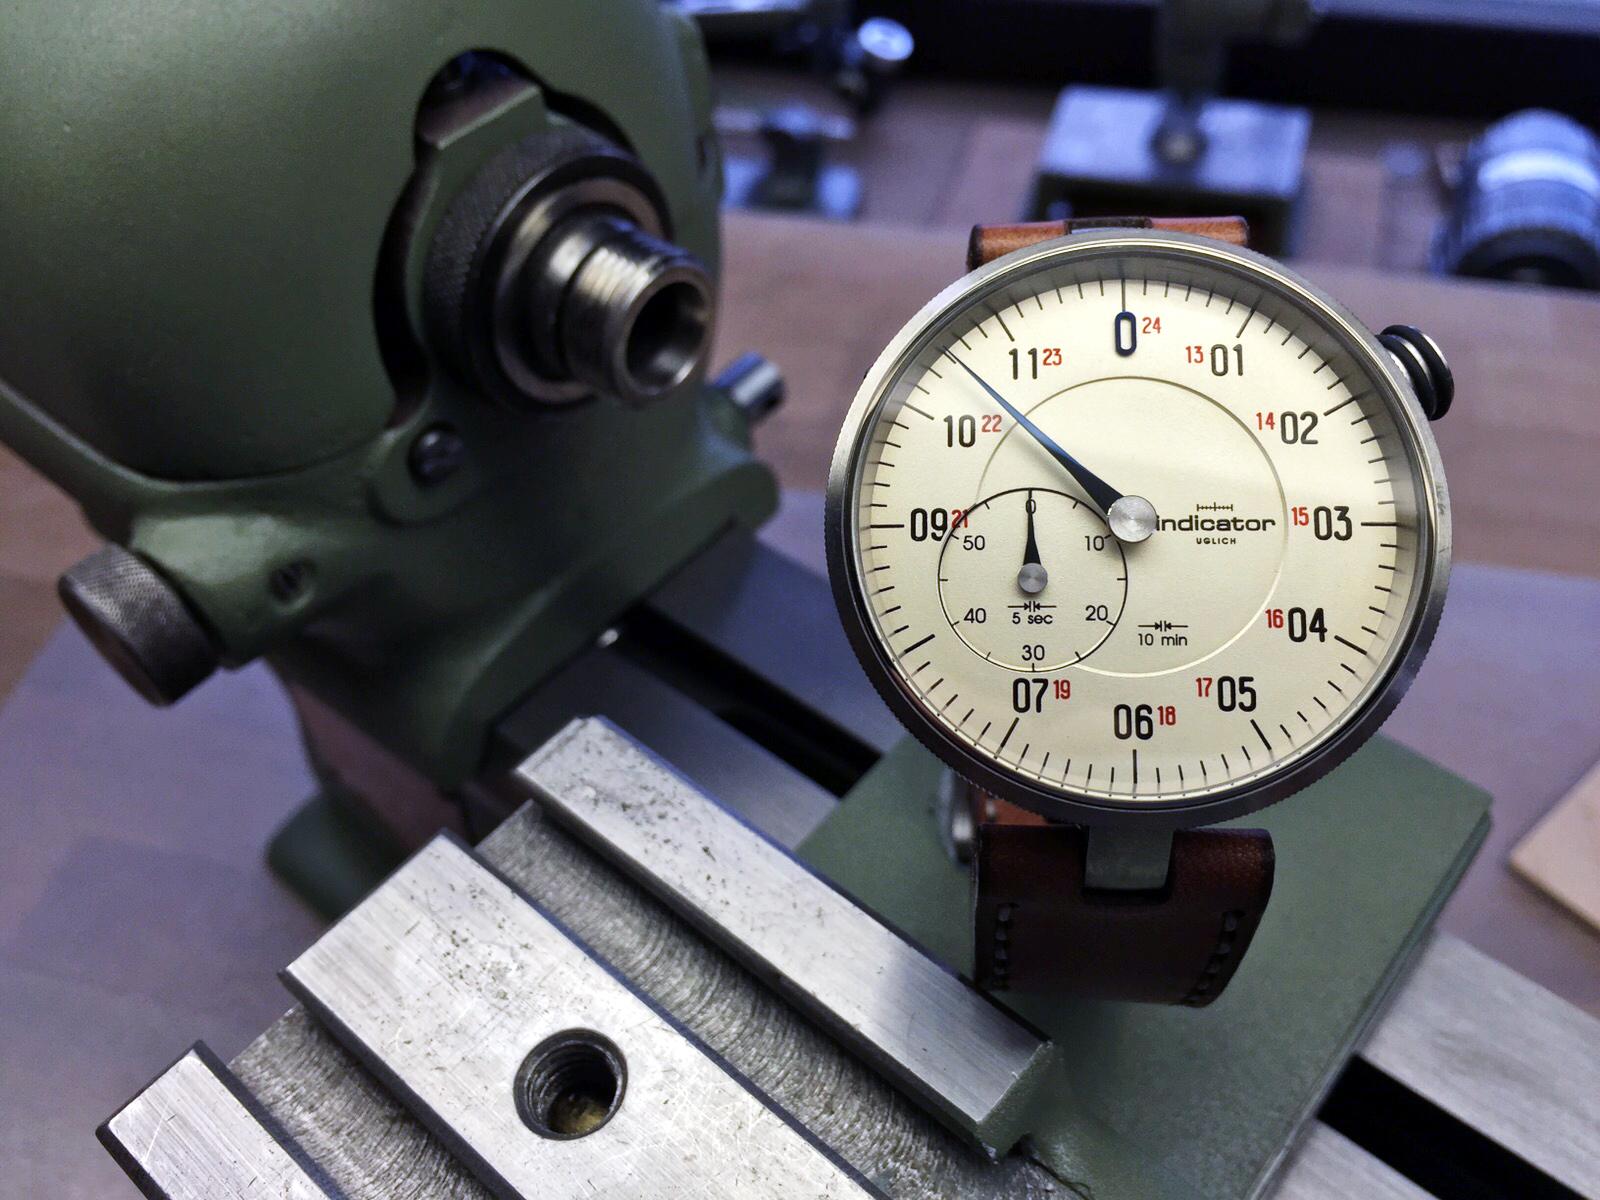 New RUSSIAN time tool INDICATOR-img-20151003-wa0000.jpg